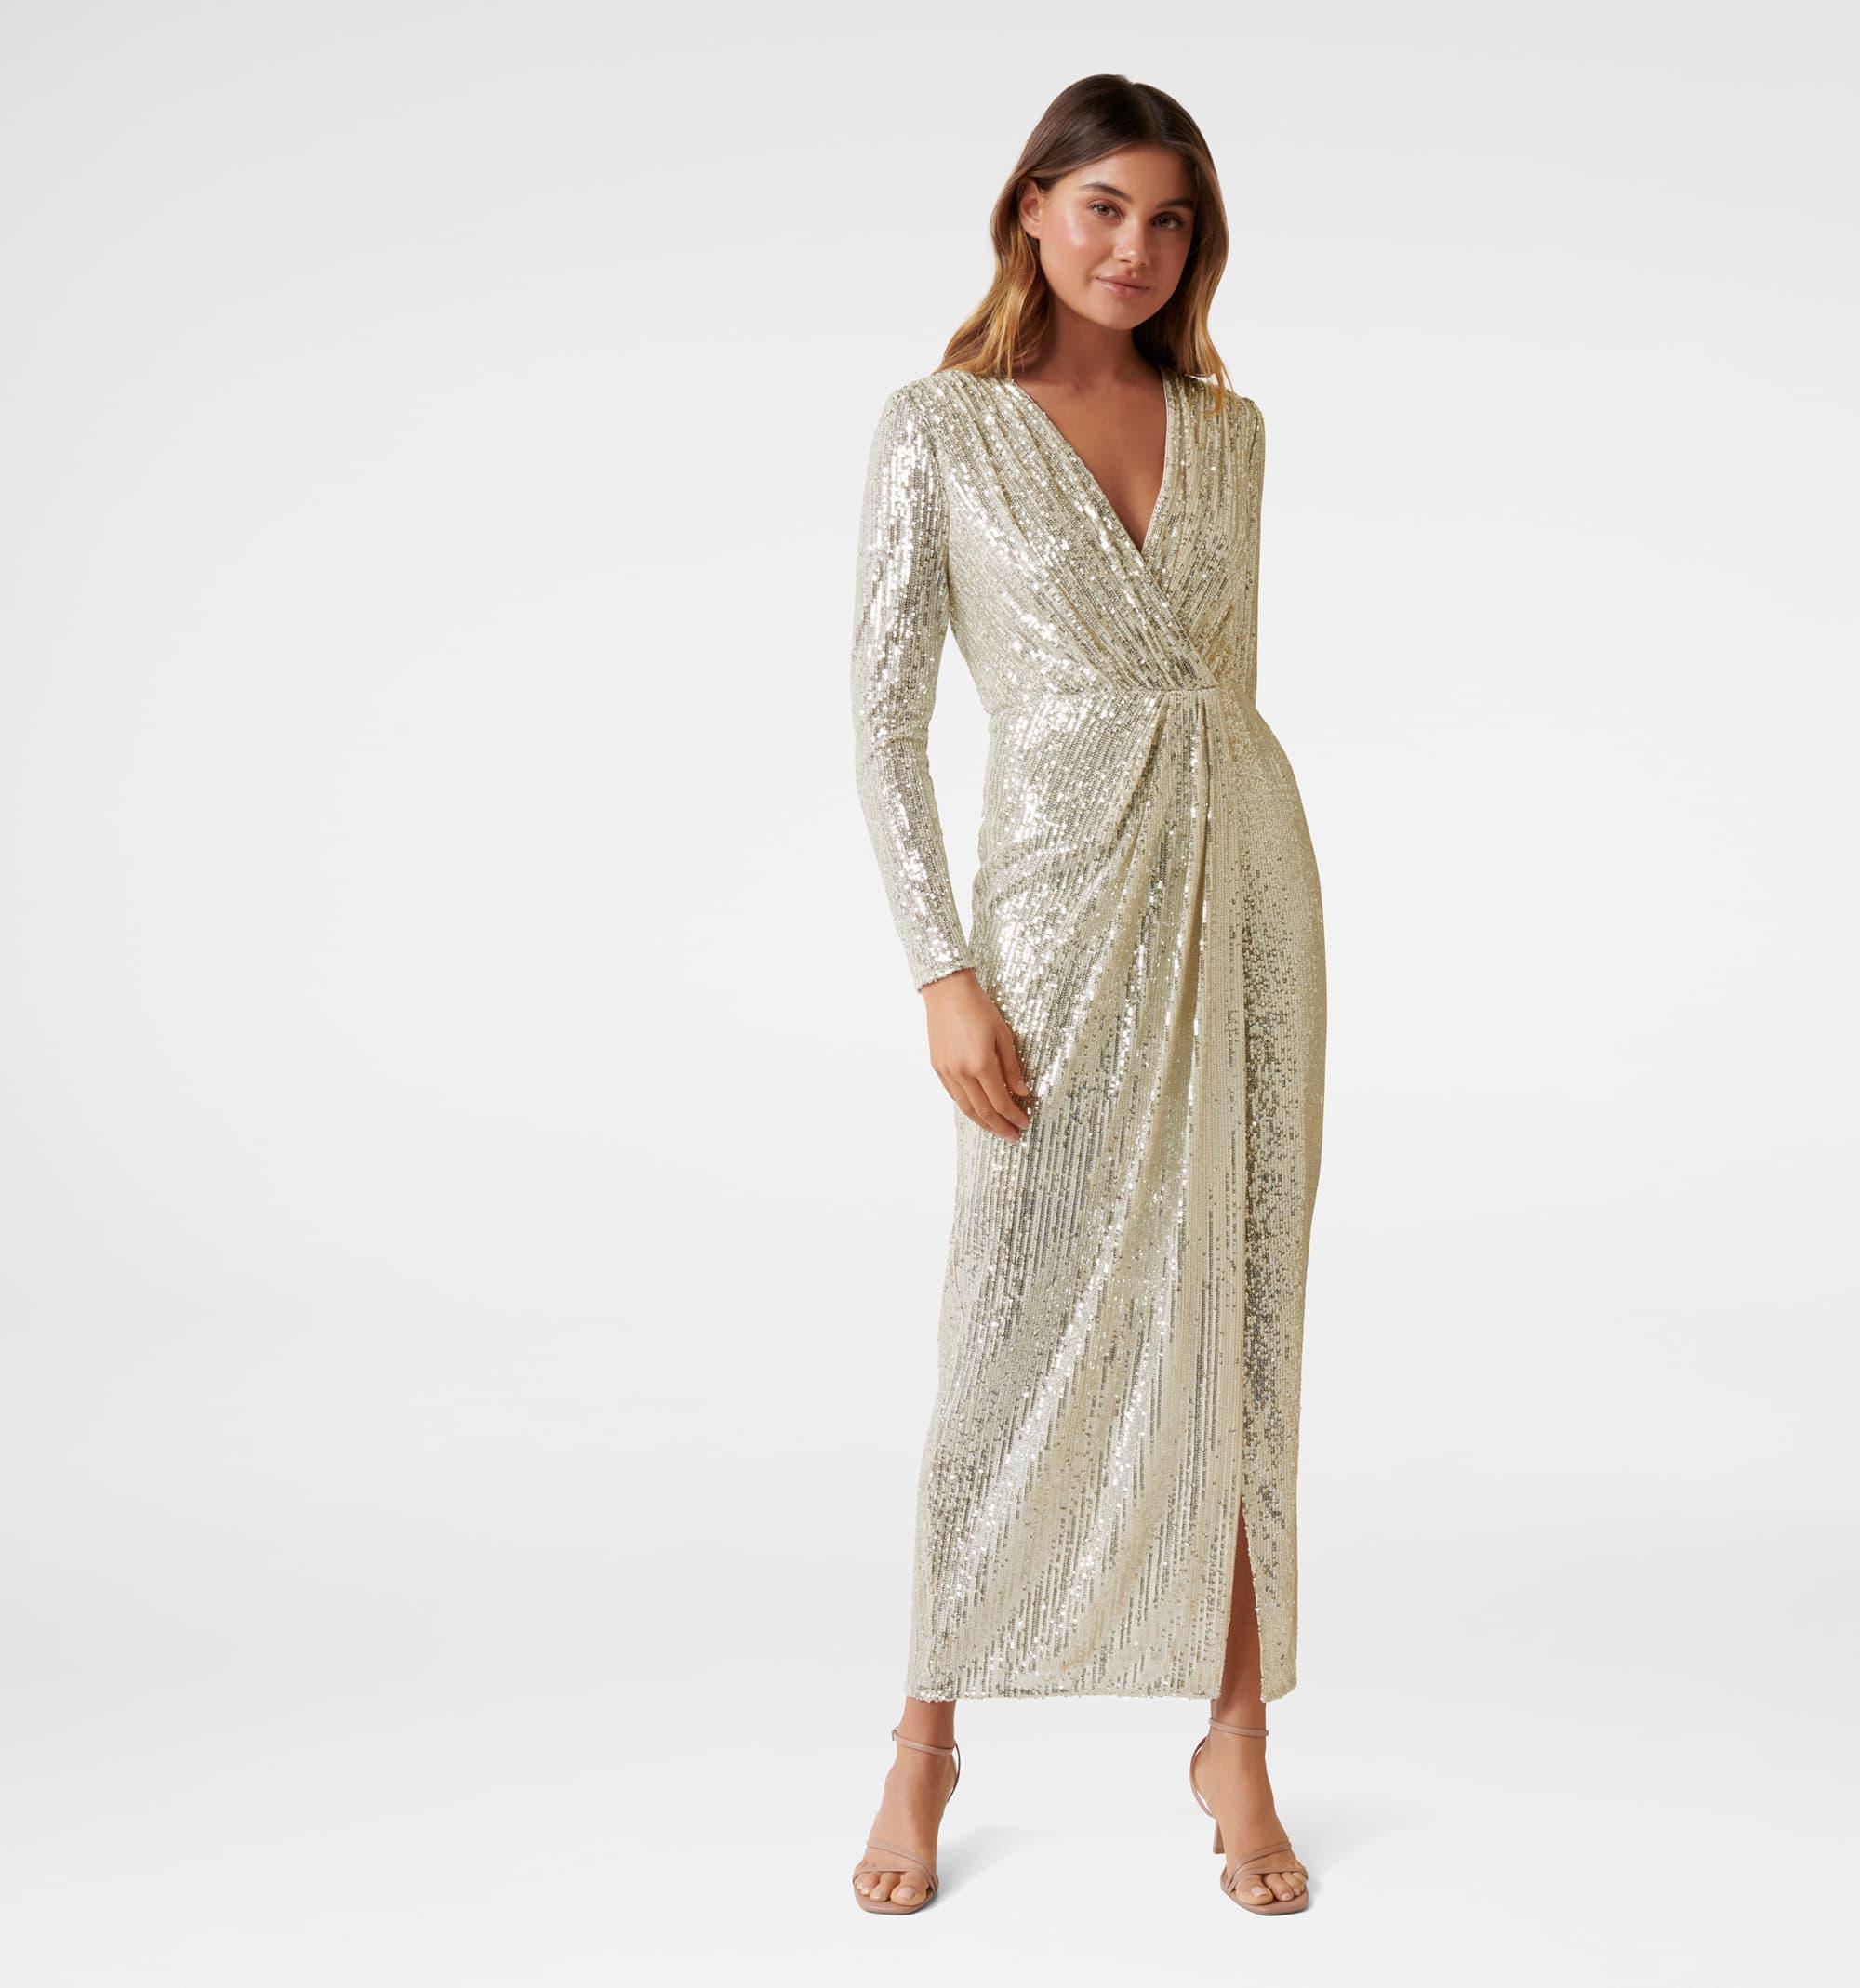 Tania Long Sleeve Sequin Maxi Dress